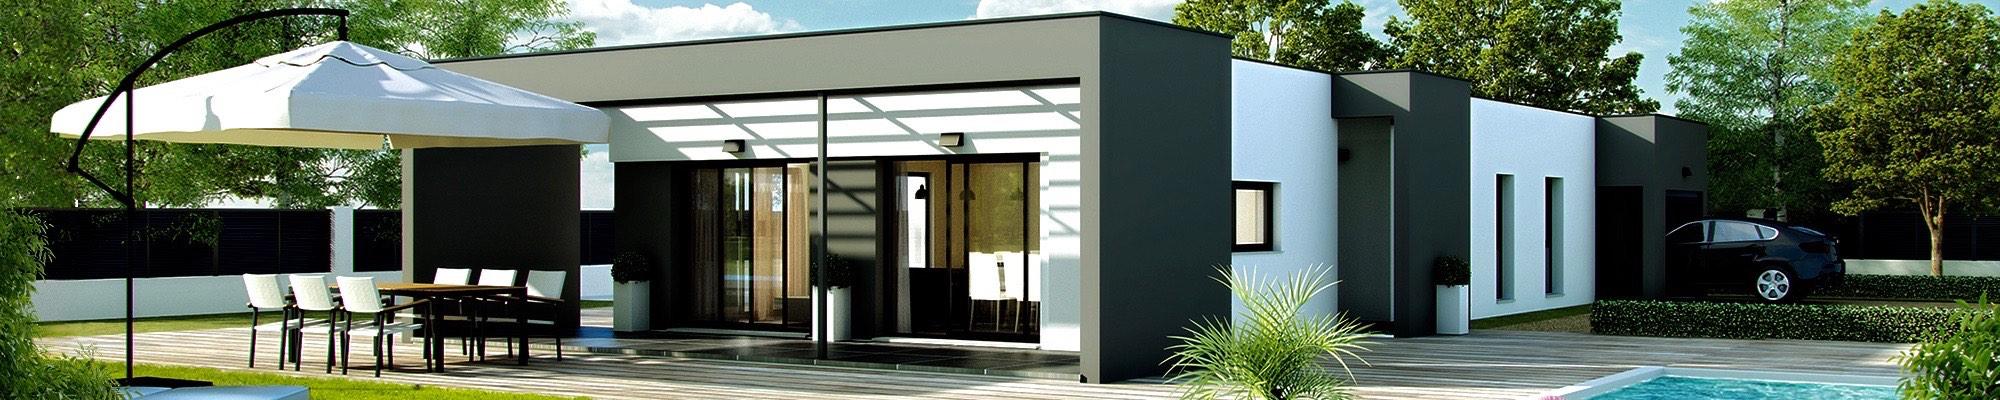 Meilleur constructeur de maison gironde segu maison for Meilleur constructeur maison individuelle